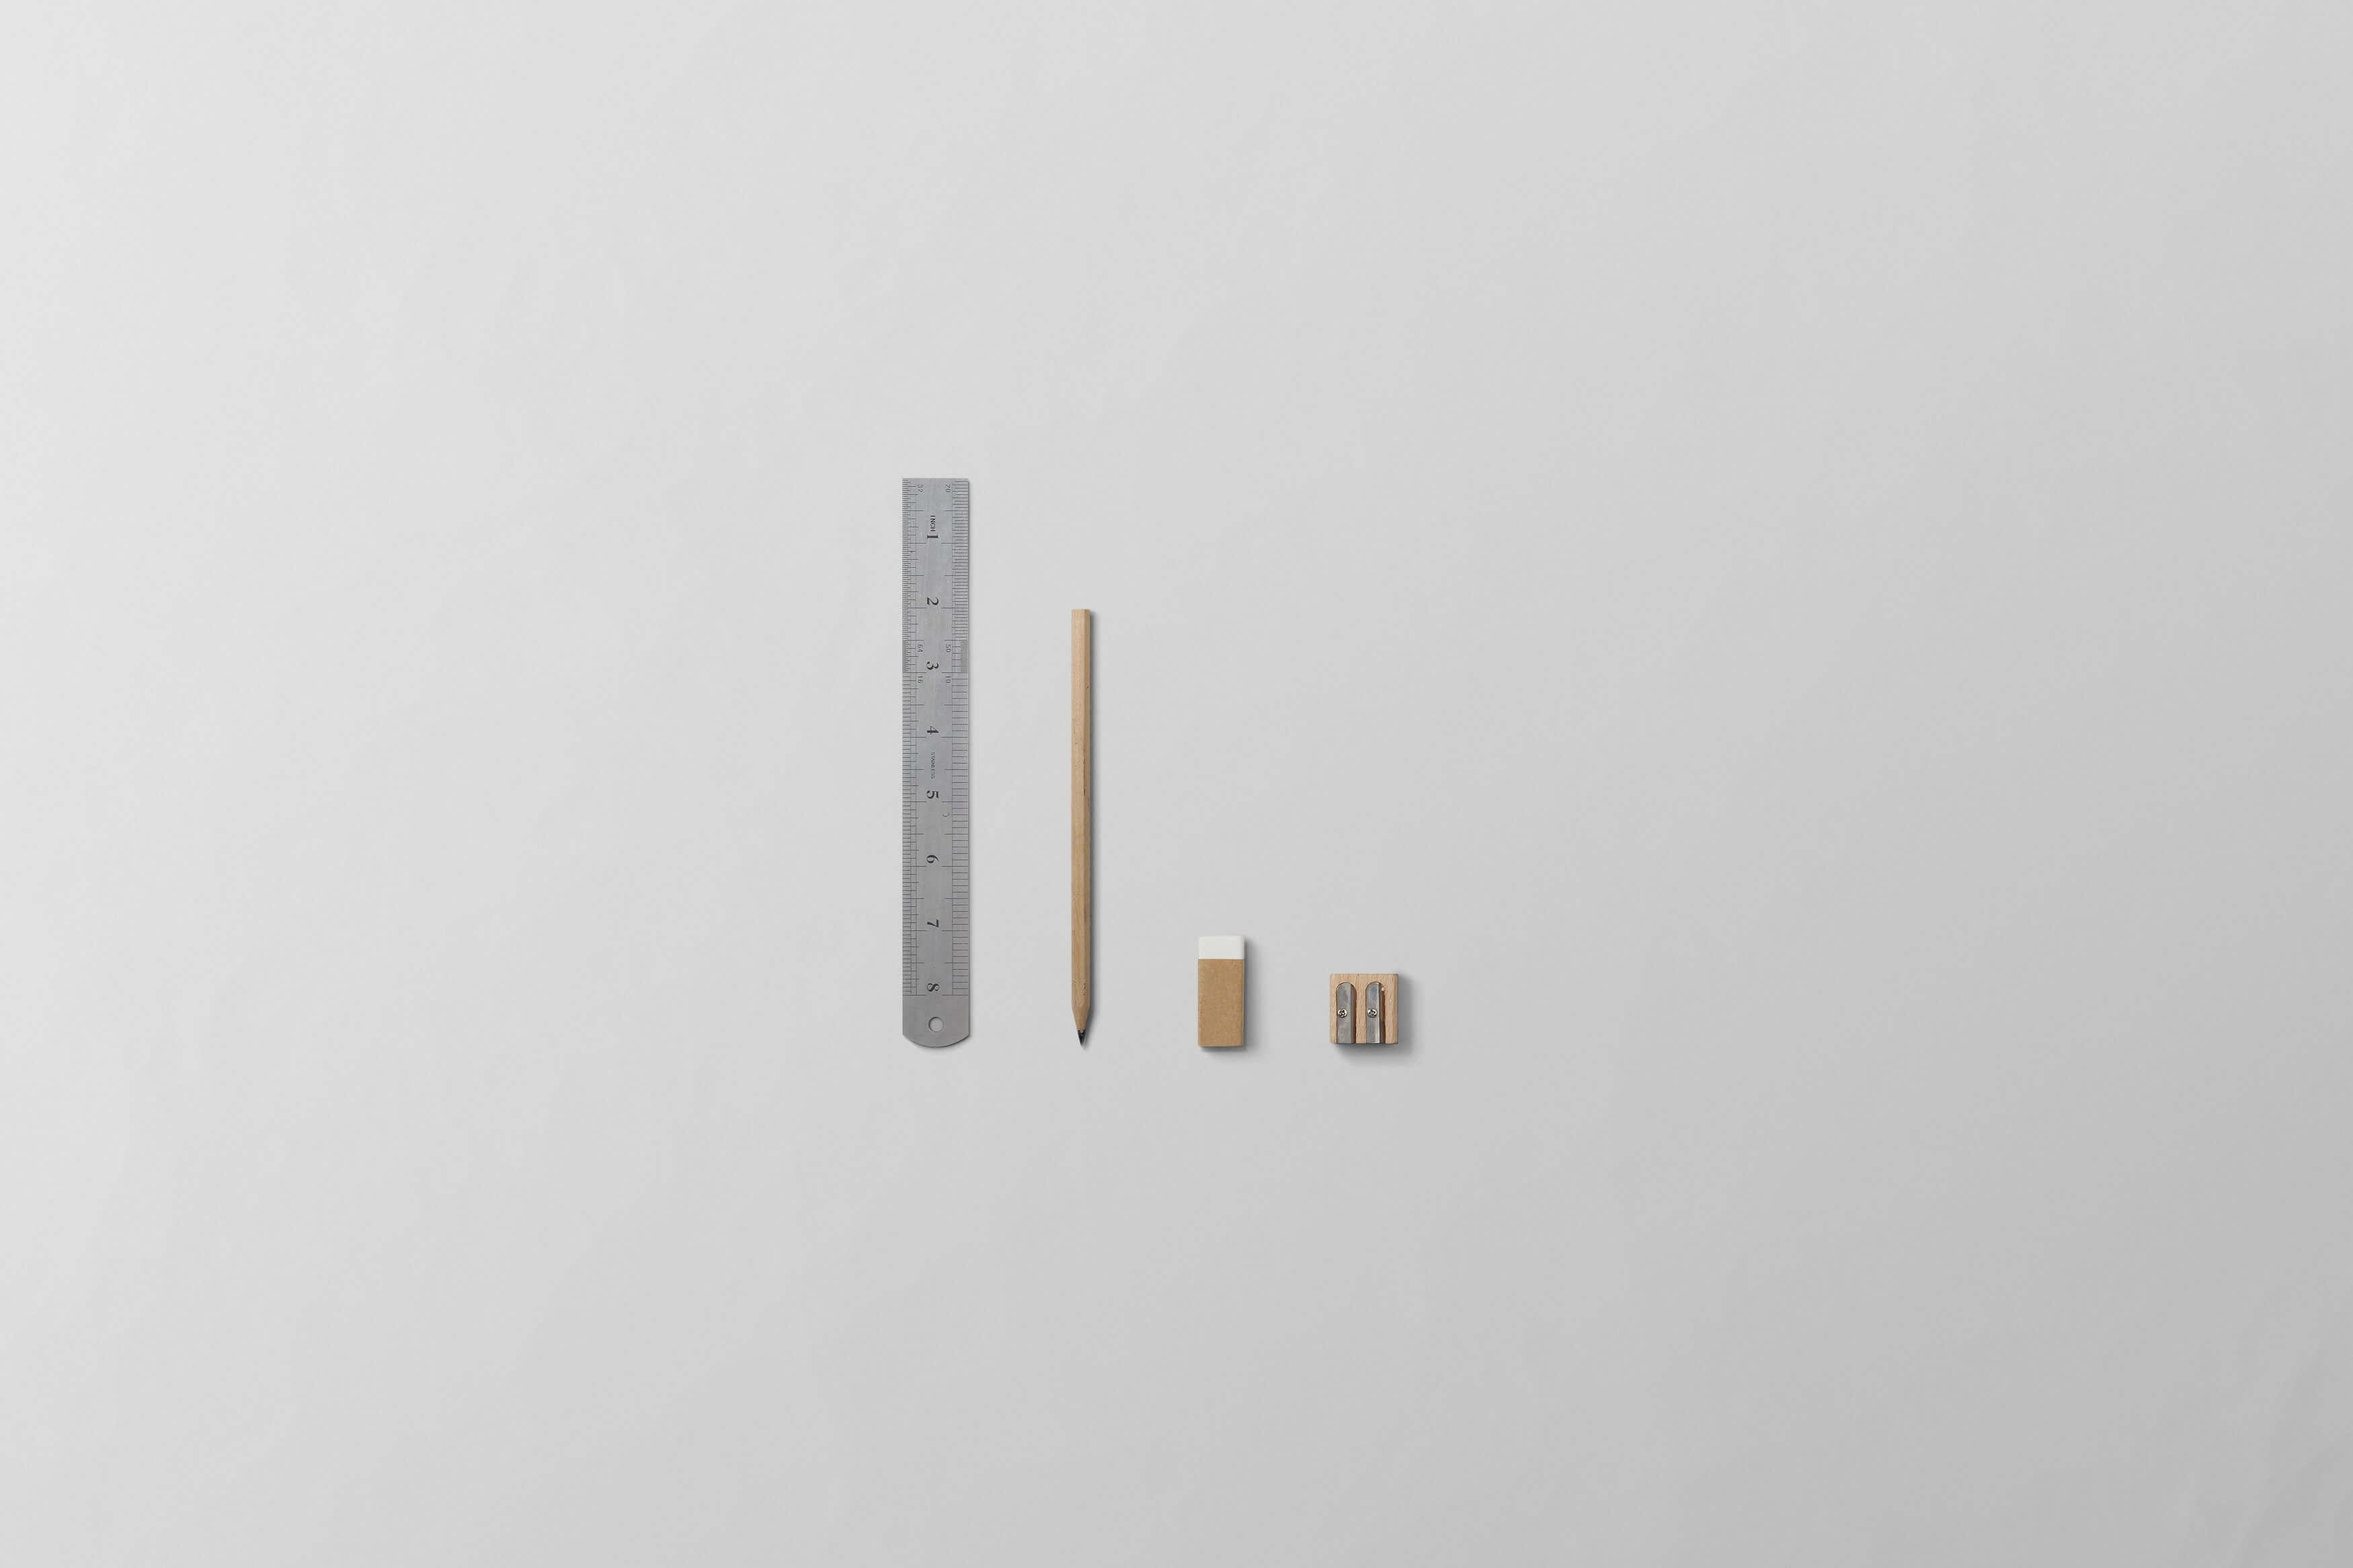 Schemi Elettrici Unifilari E Multifilari : Manuale d uso sienergy integra